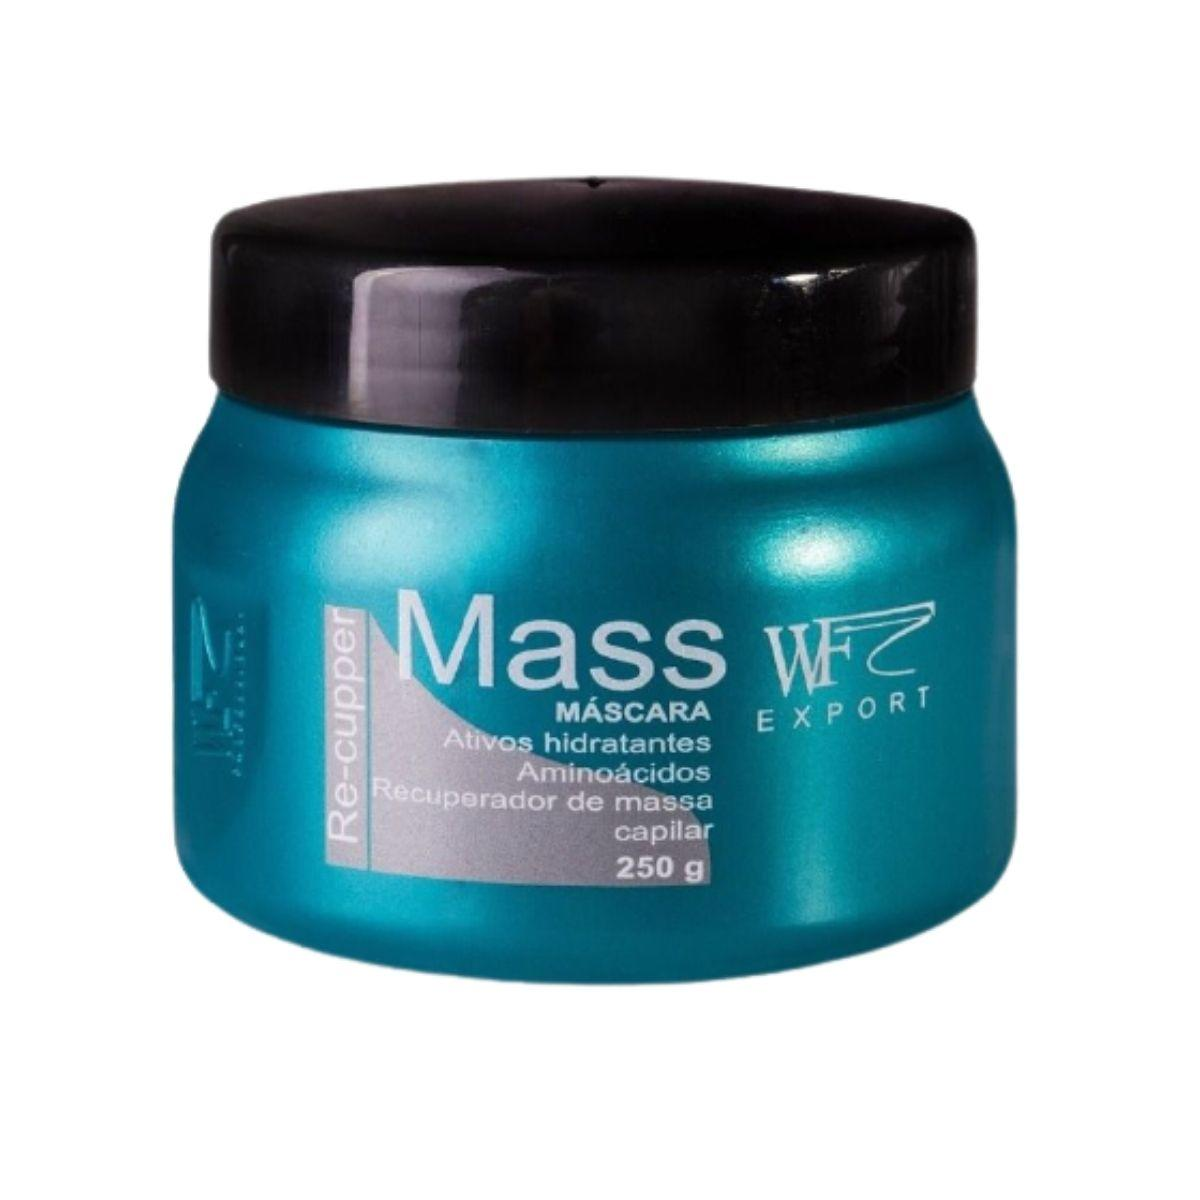 RE-CUPPER - MASCARA MASS WF COSMETICOS 250G